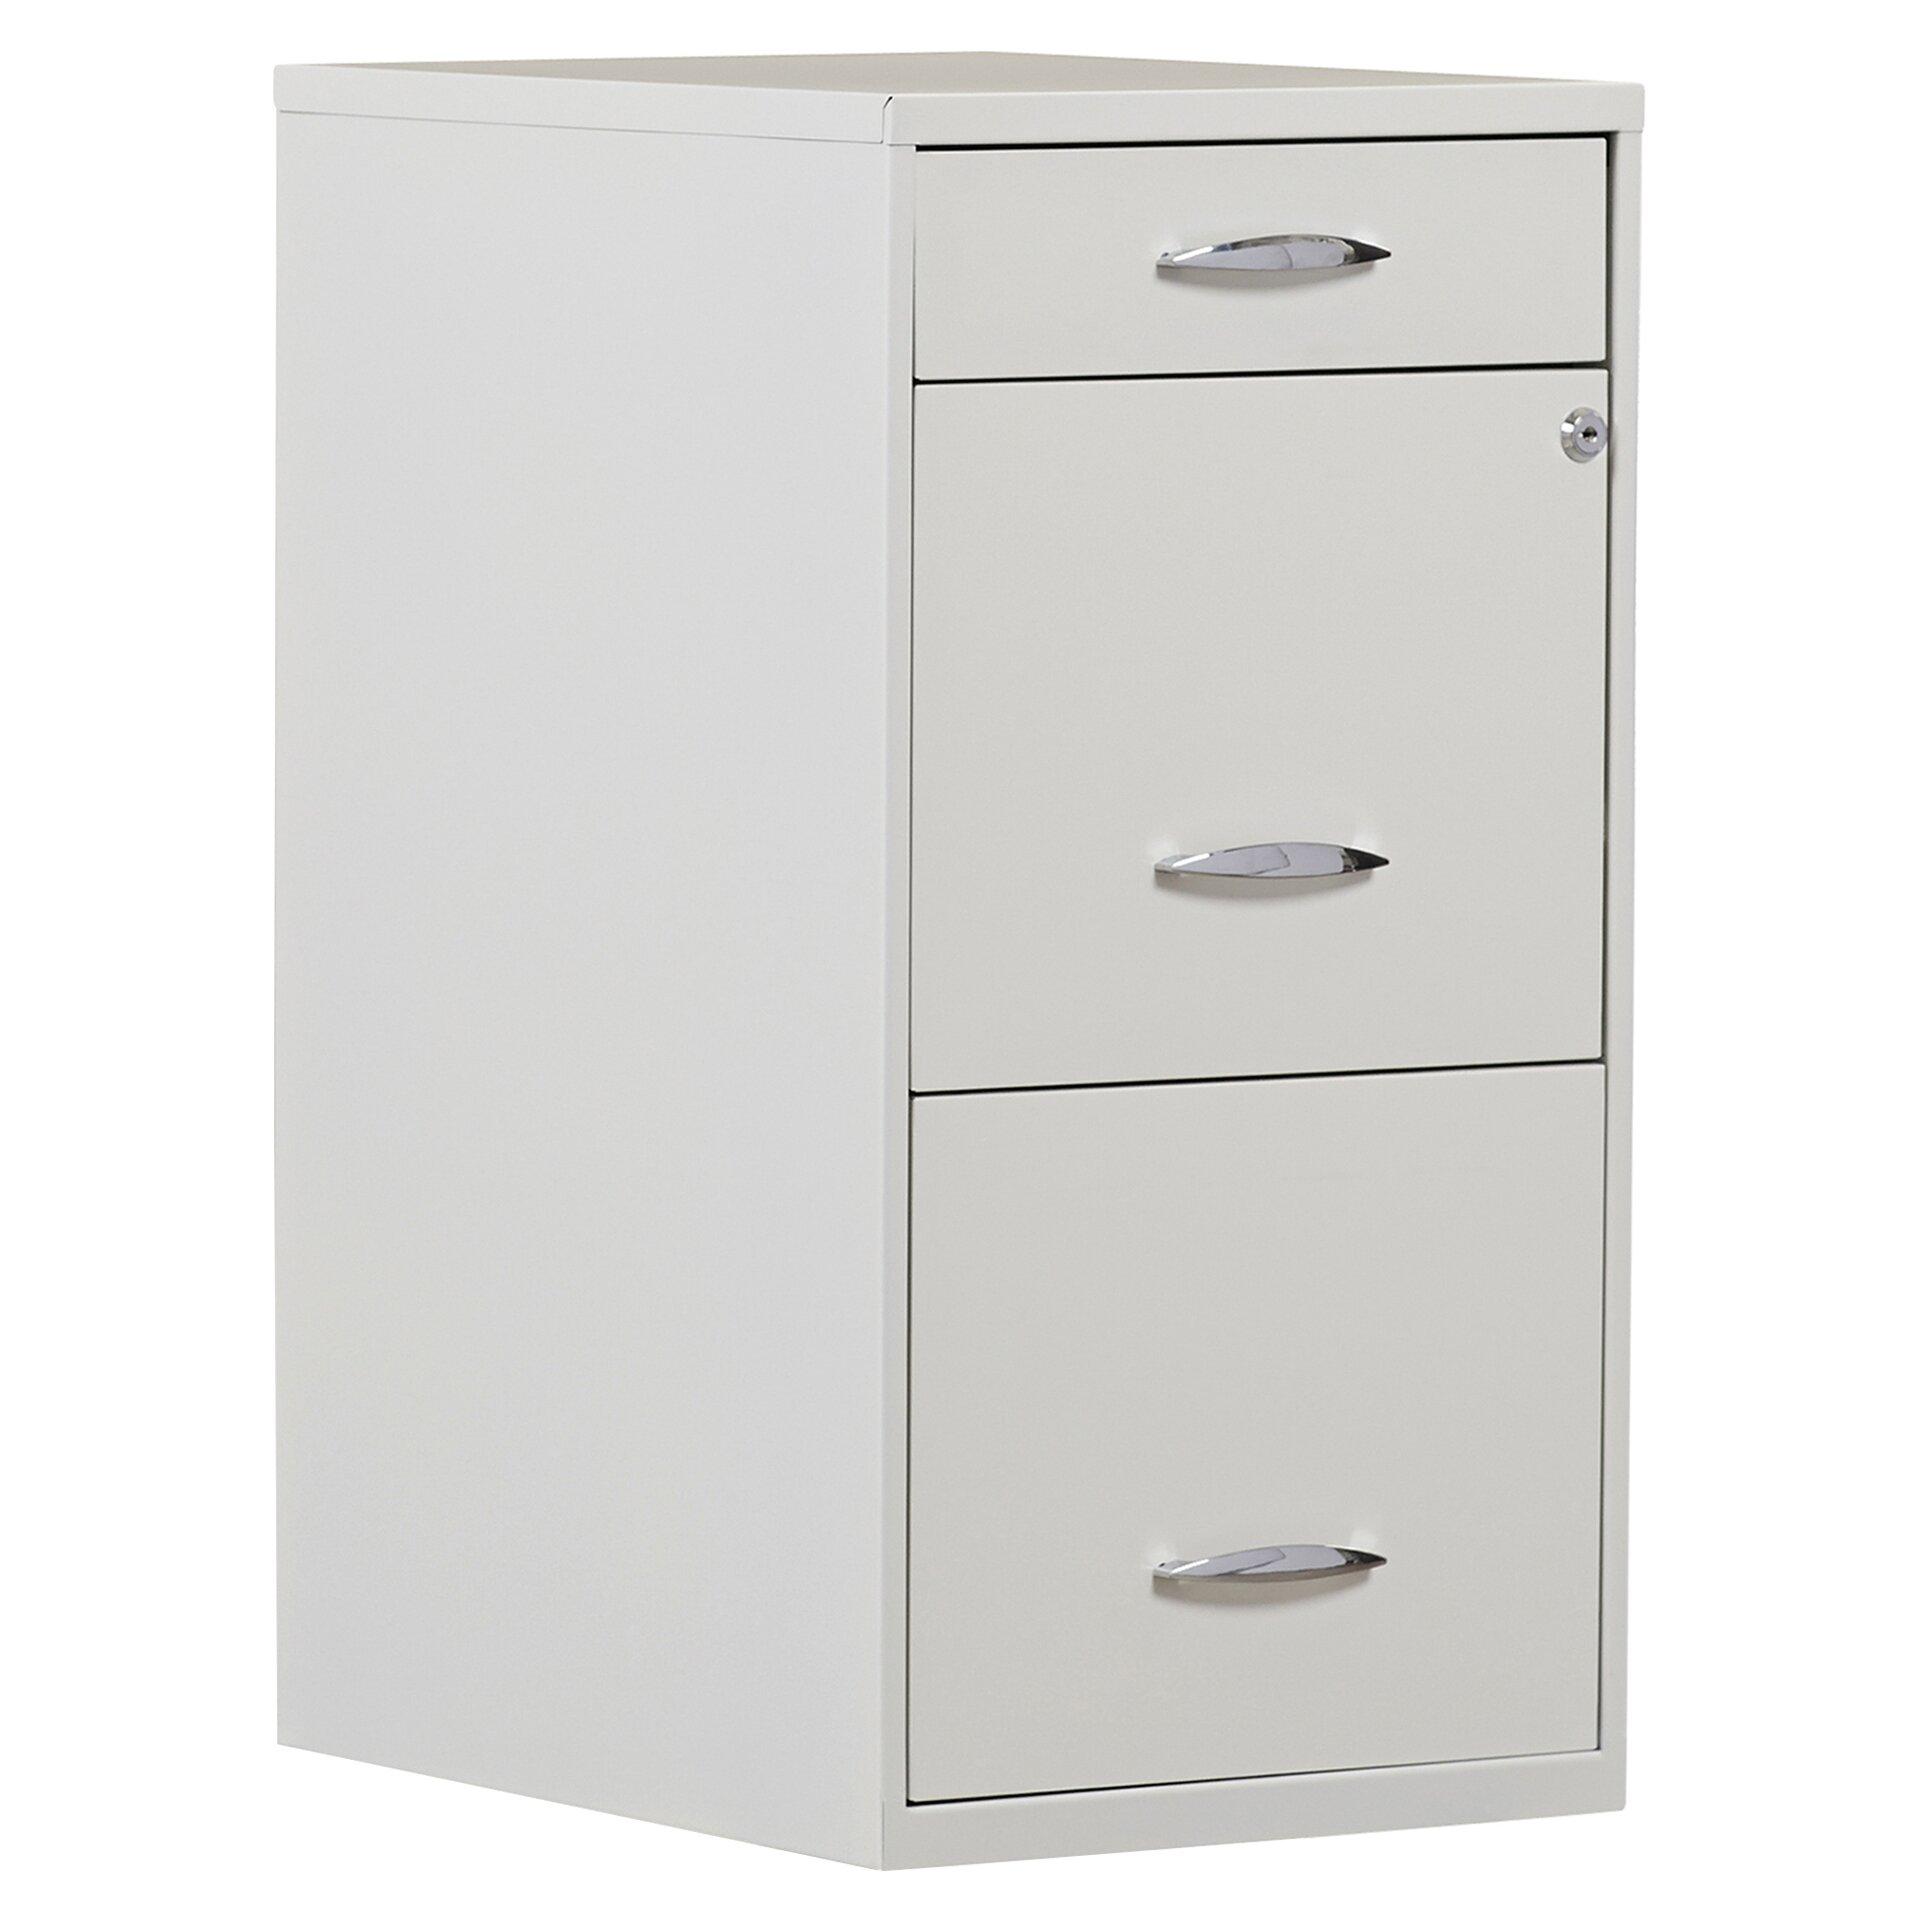 Bed furniture top view - Symple Stuff Steel 3 Drawer Filing Cabinet Amp Reviews Wayfair